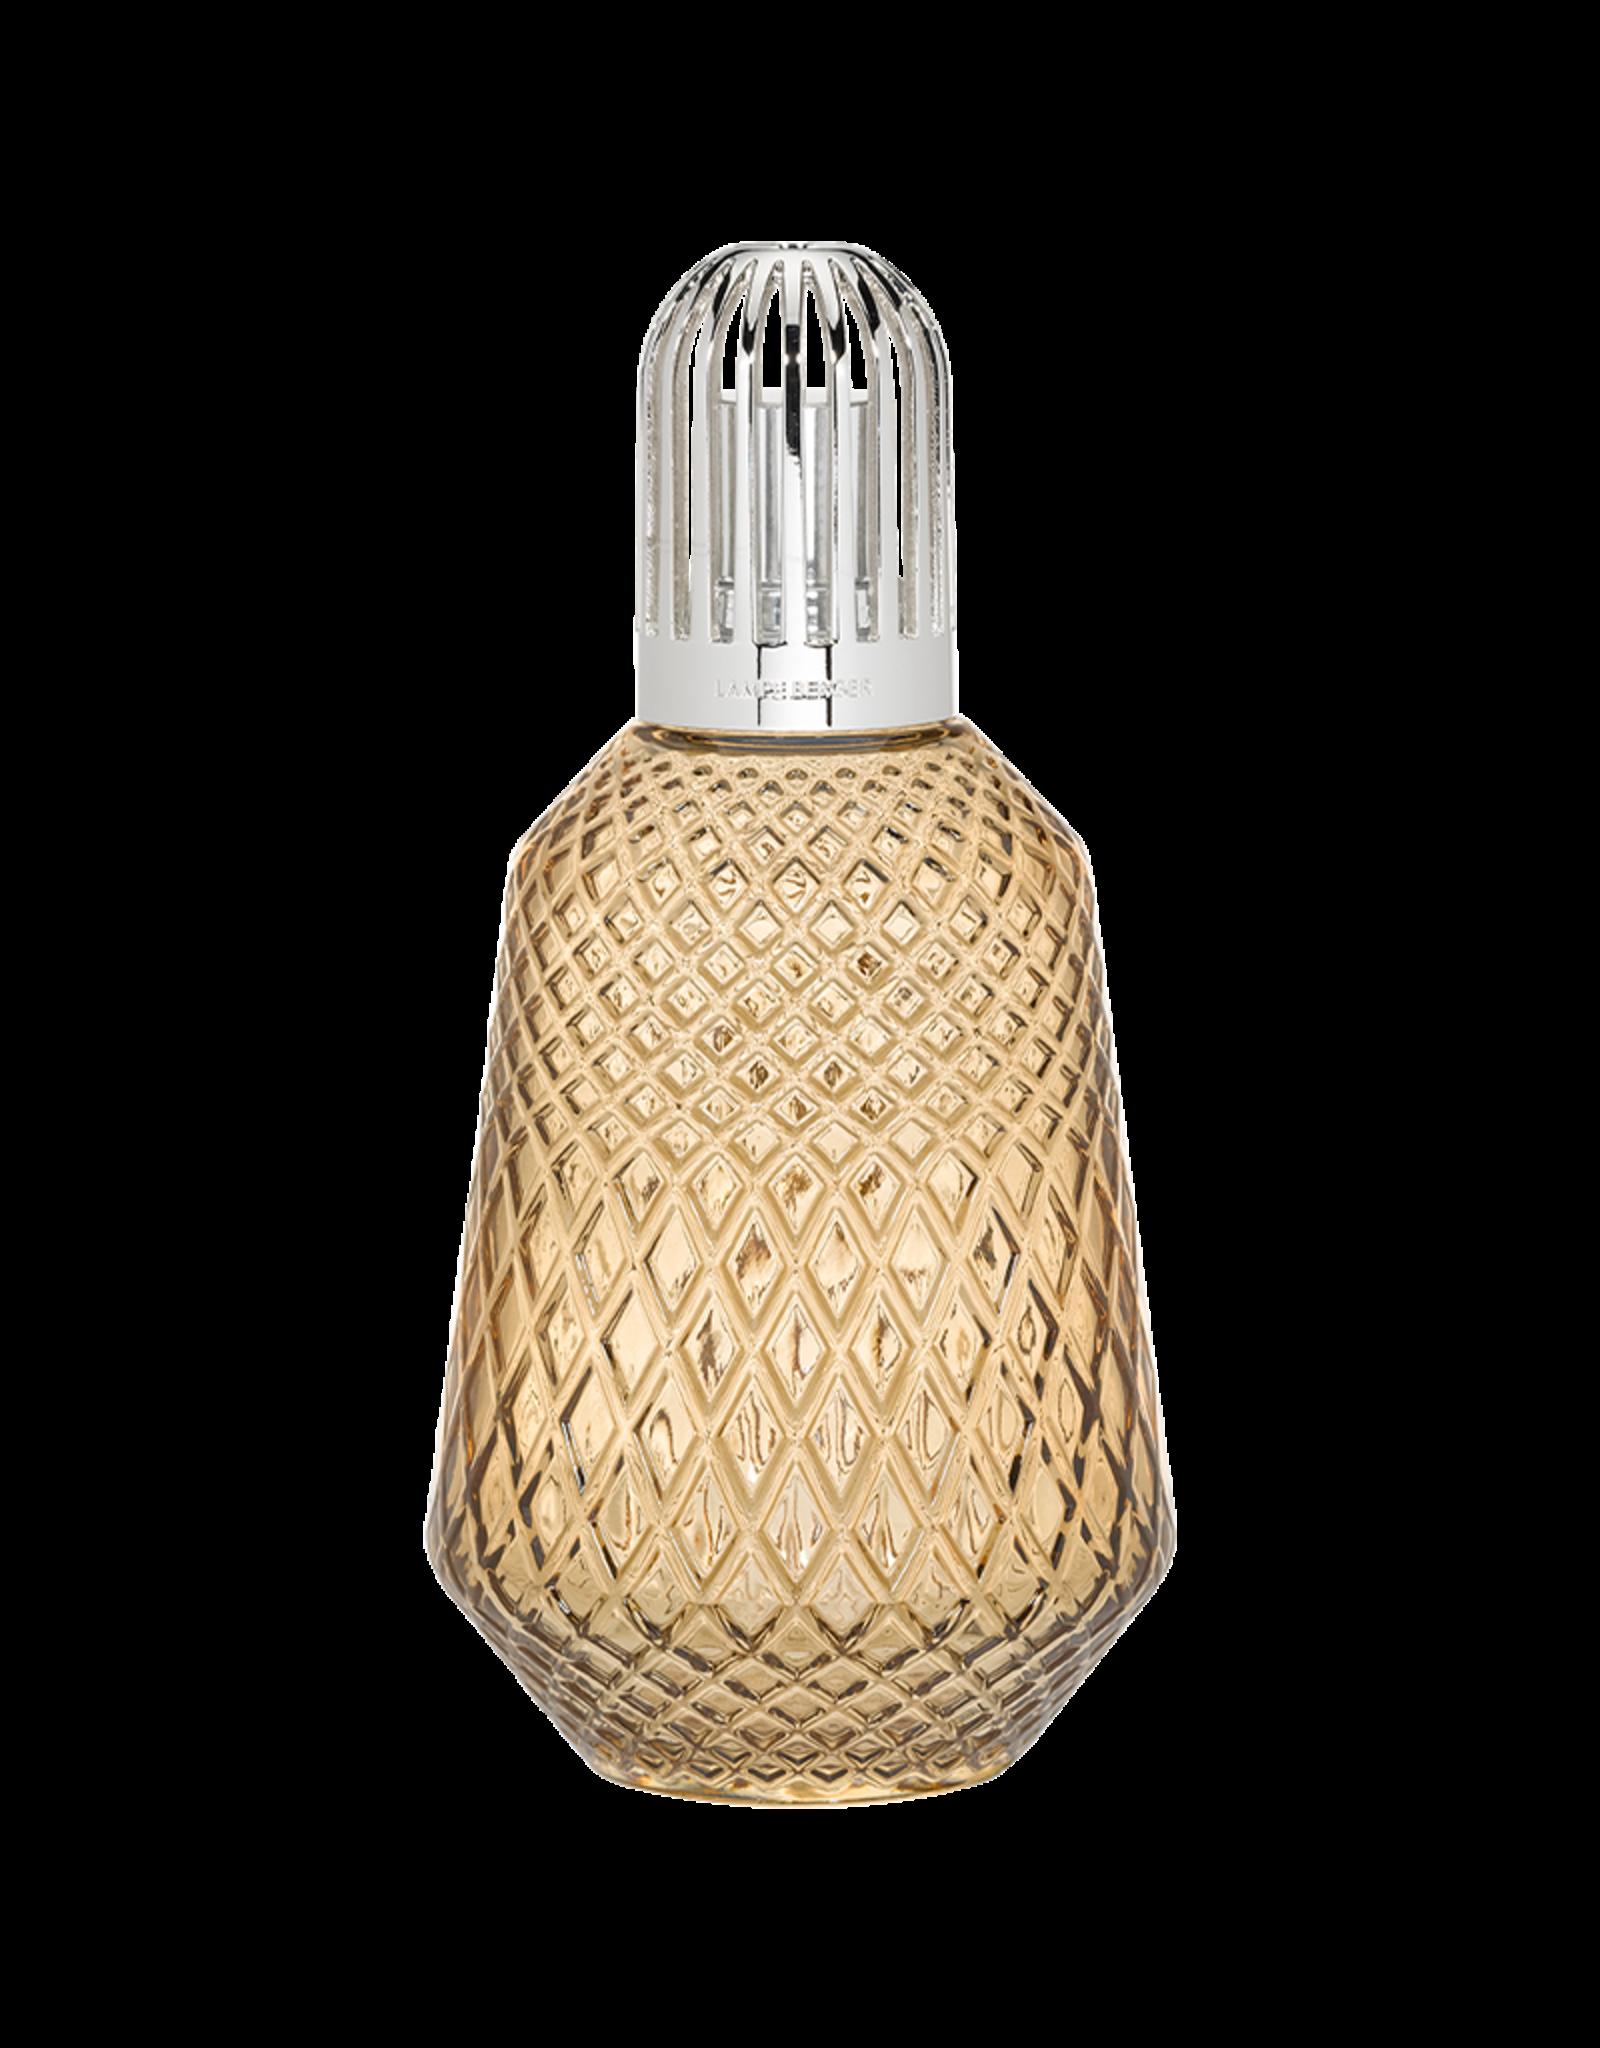 Lampe Berger Geurbrander Matali Crasset - Chestnut